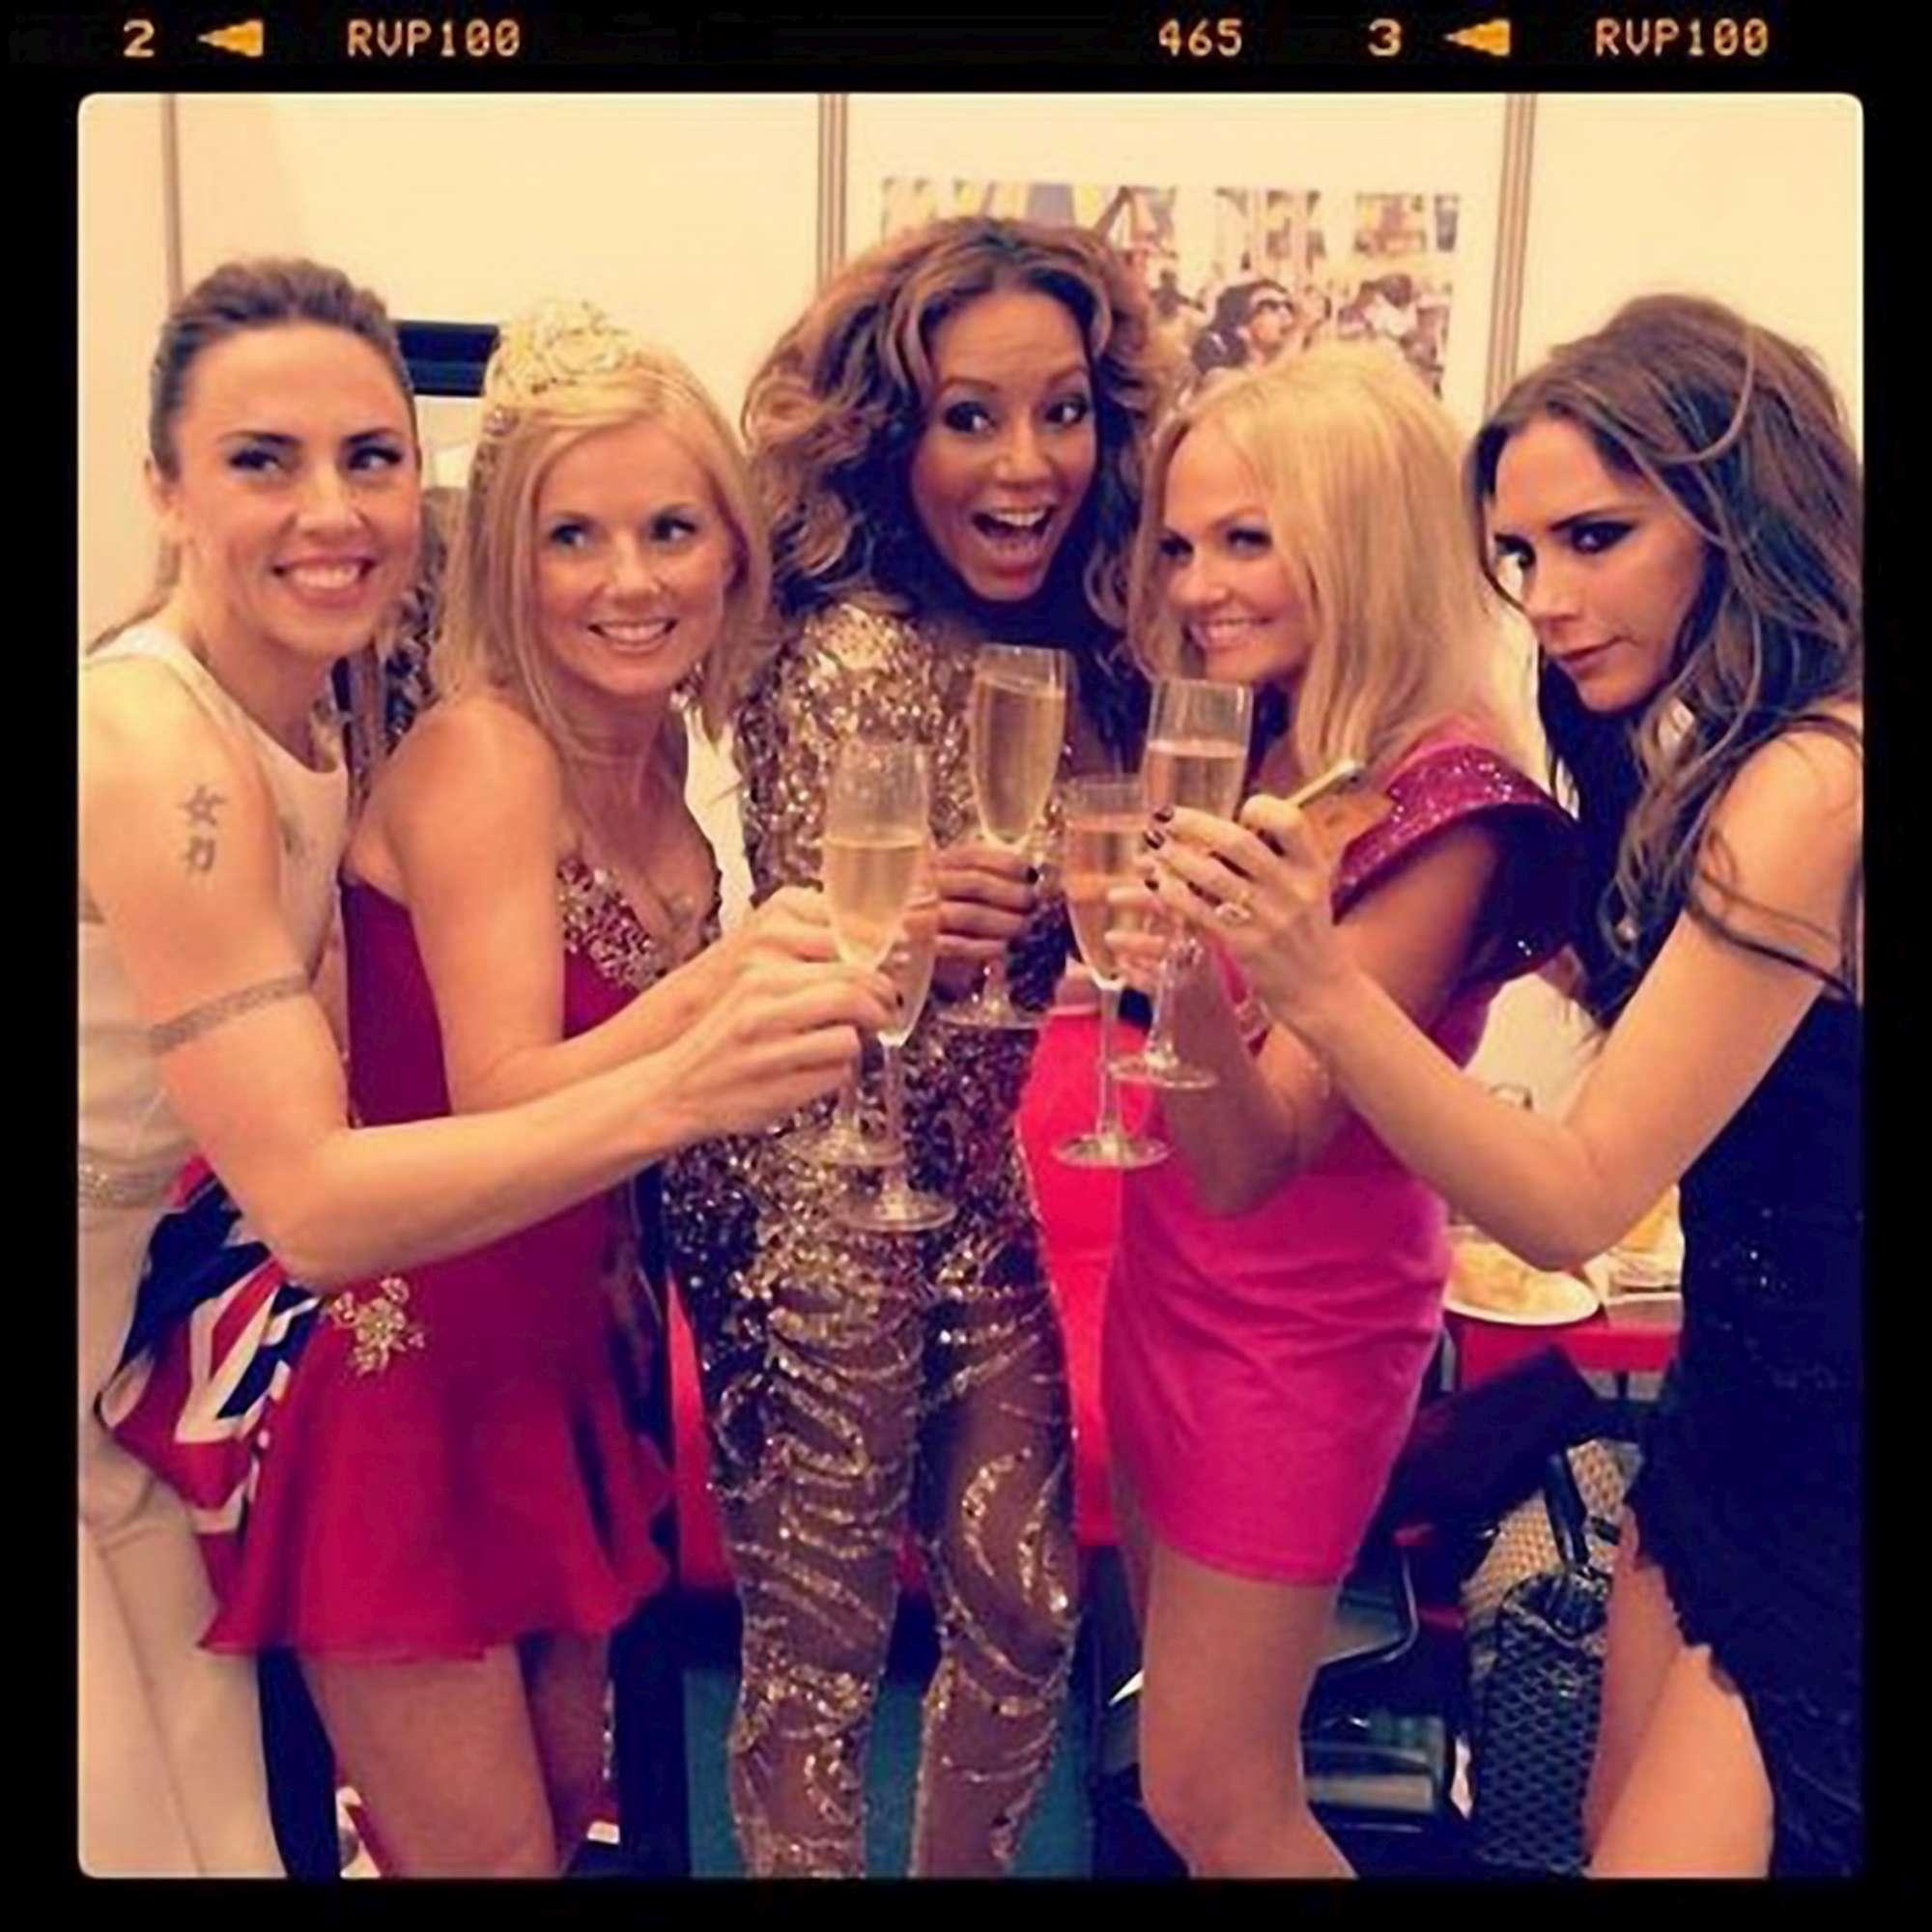 Spice Girls, tra Mel B e Geri intesa speciale?